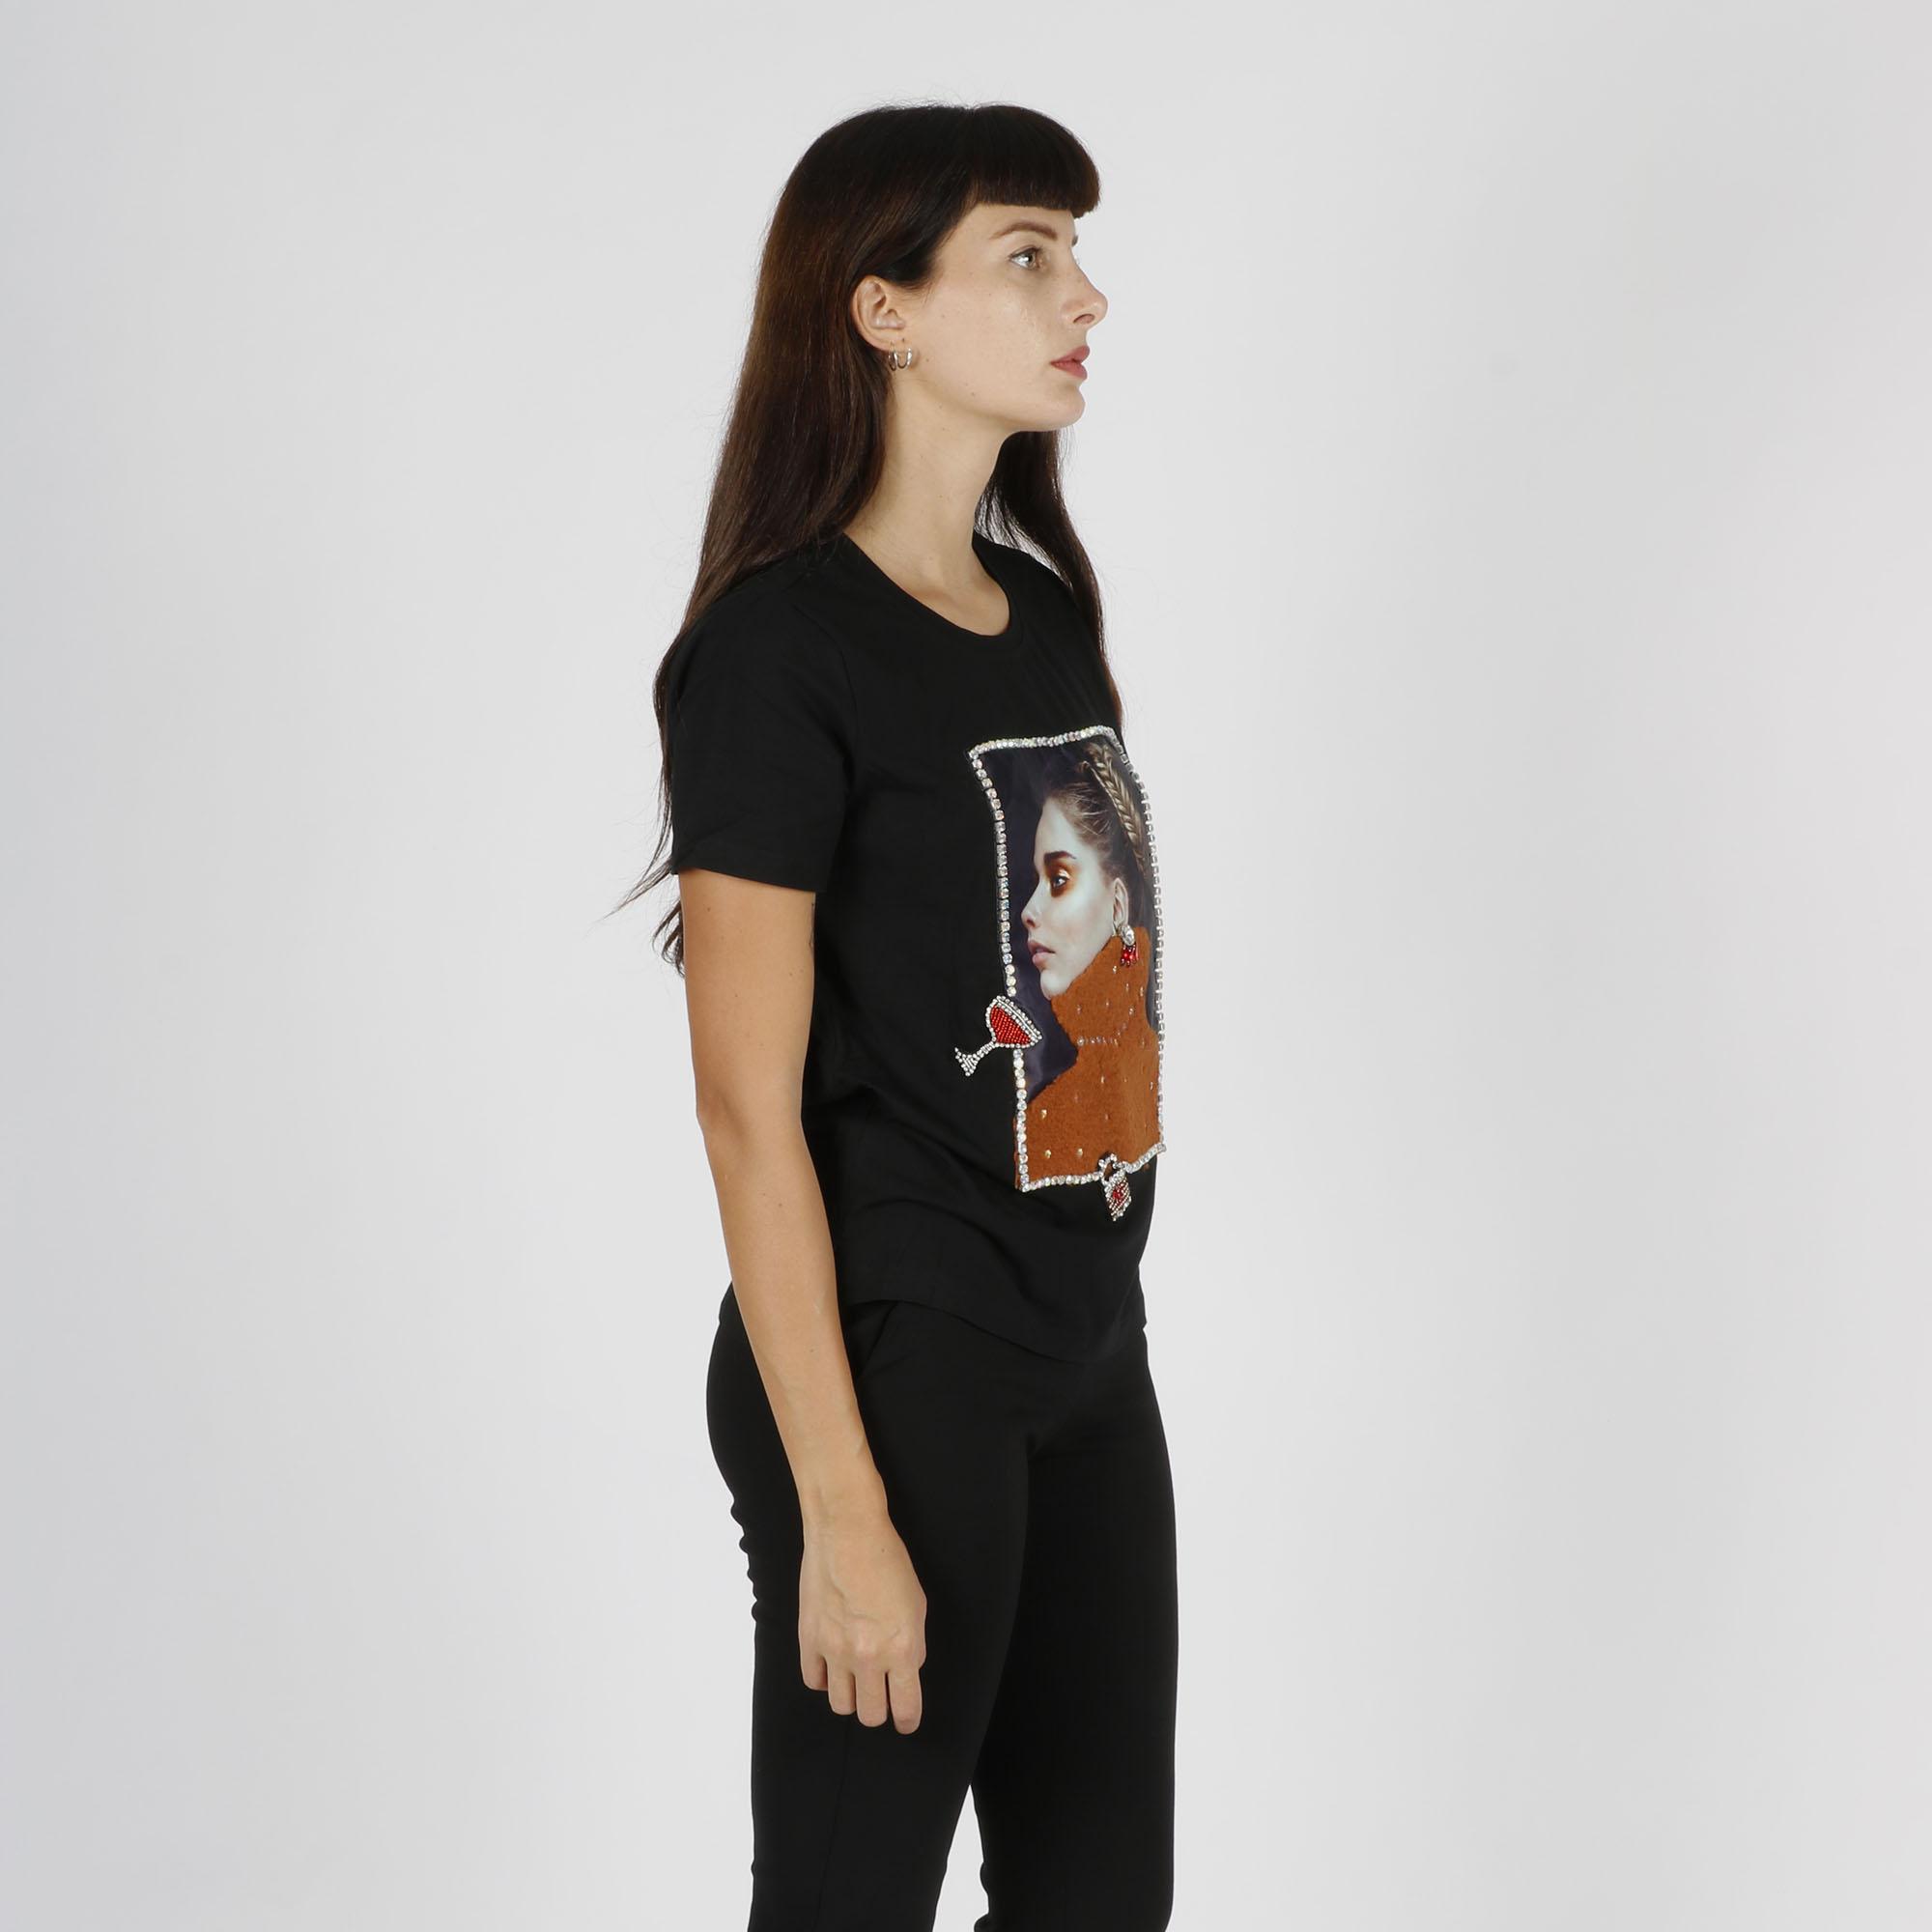 T-shirt ragazza dolcevita - Nero